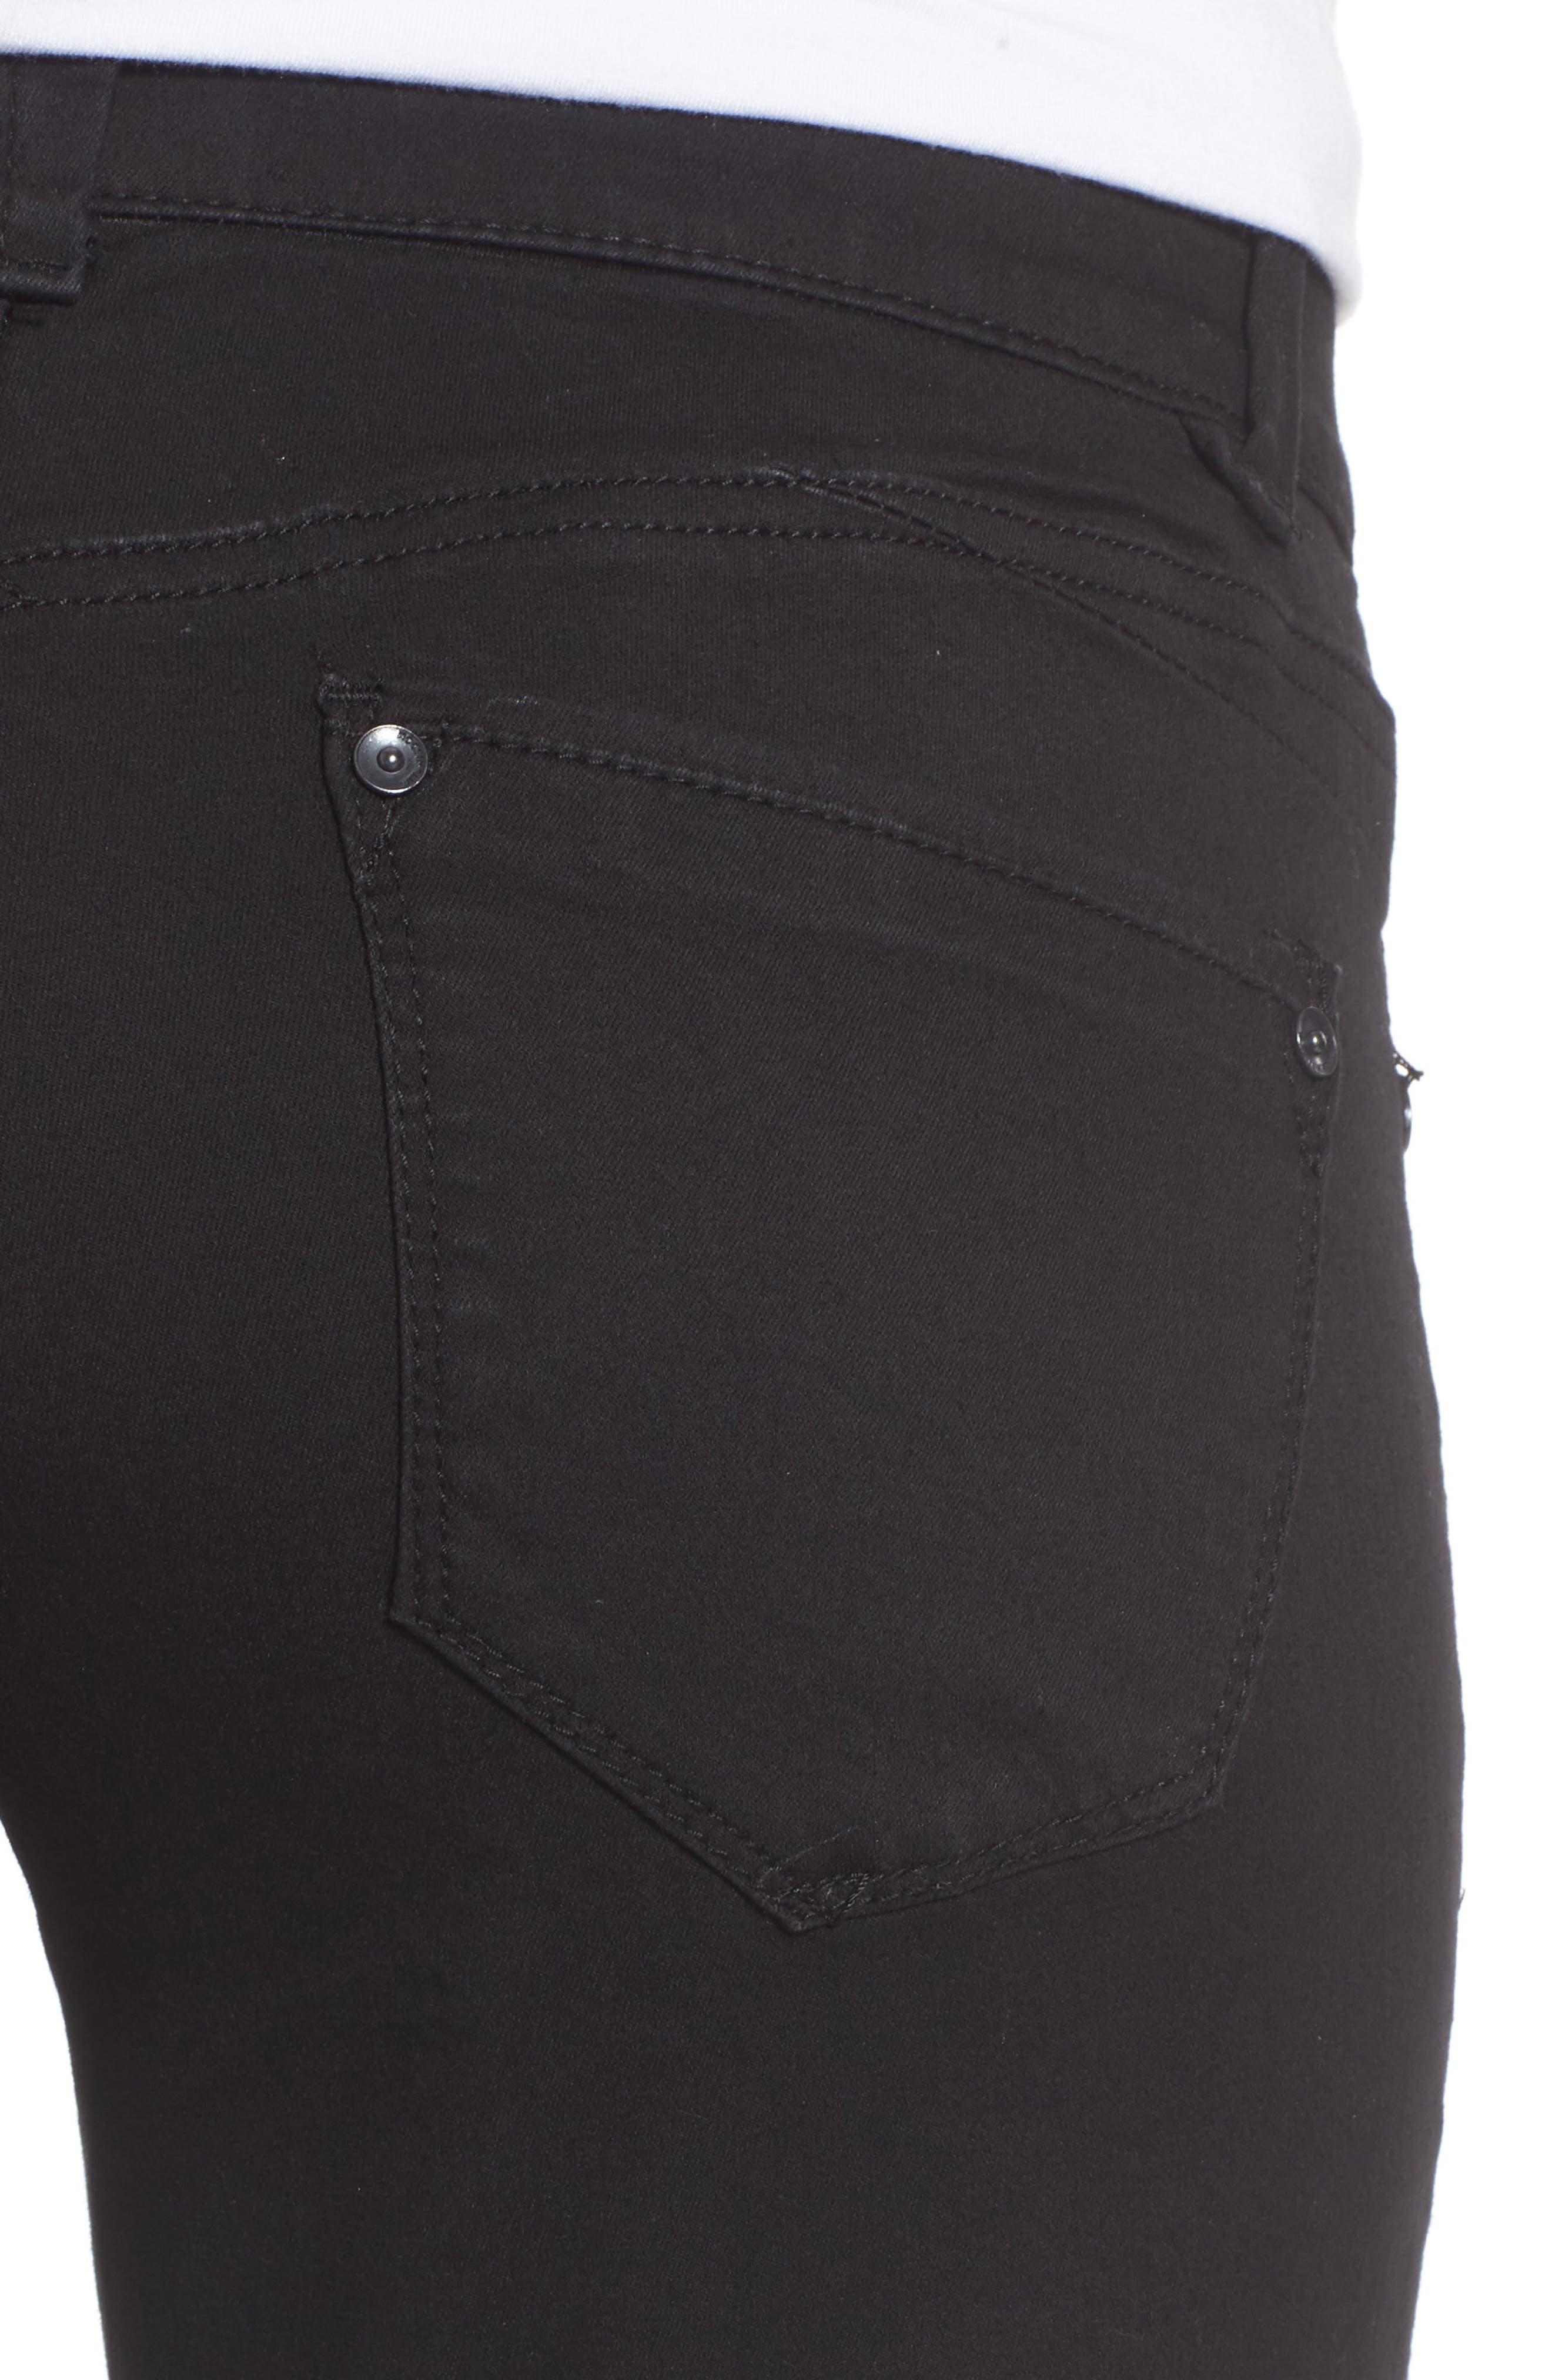 Ab-solution Straight Leg Jeans,                             Alternate thumbnail 4, color,                             BLACK